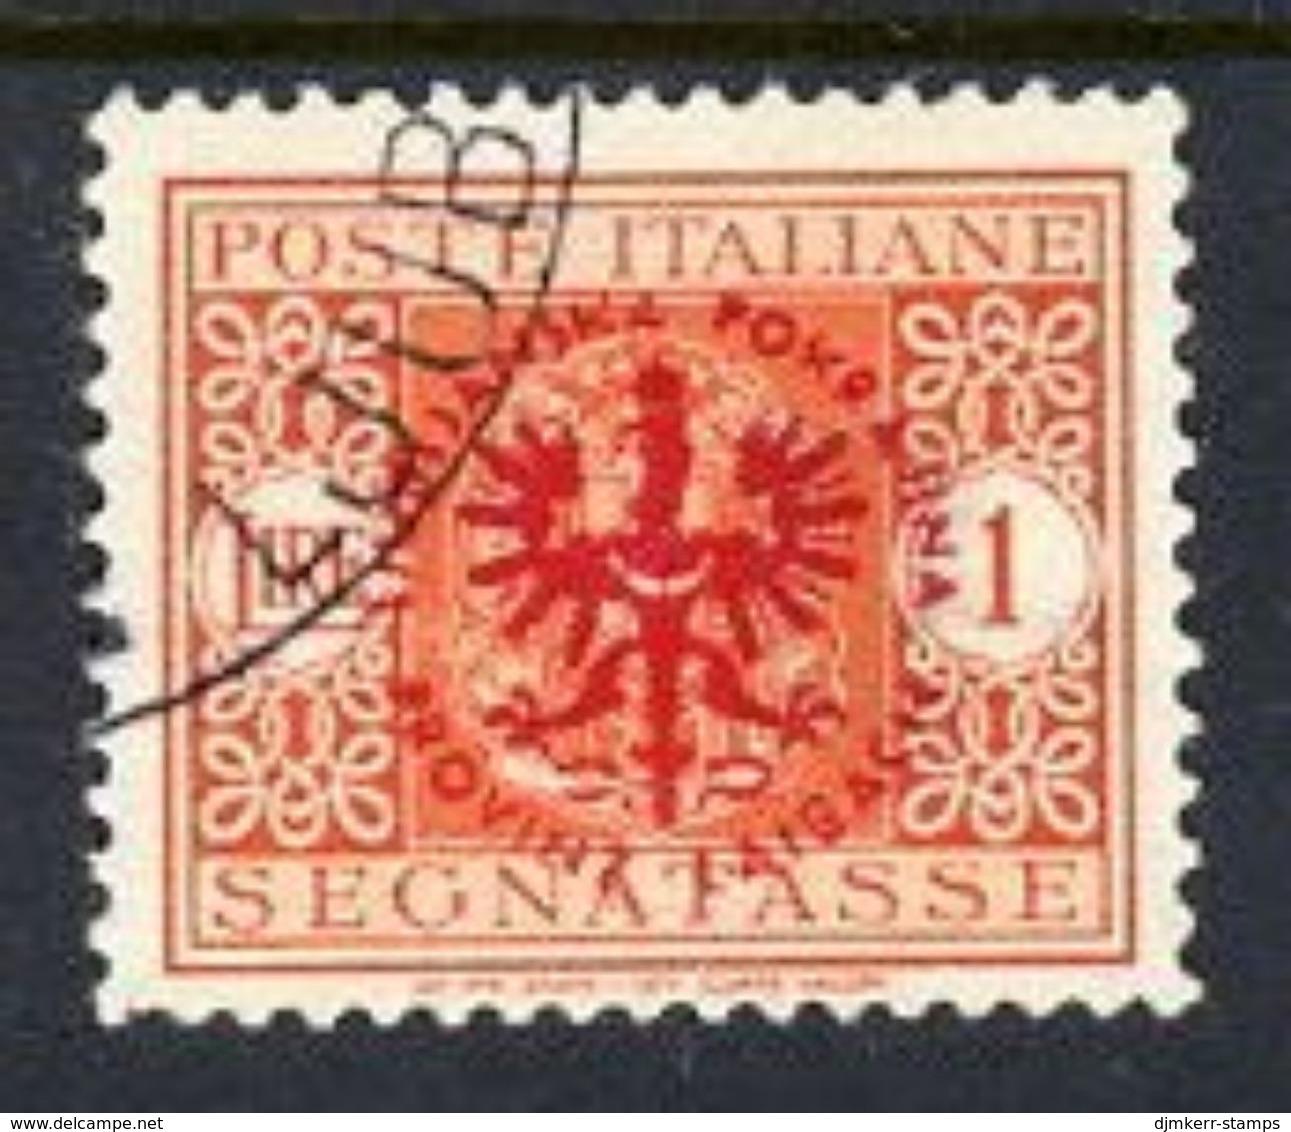 LJUBLJANA PROVINCE 1944 Postage Due 1 L. Used.  Michel Porto 8 - Occupation 1938-45